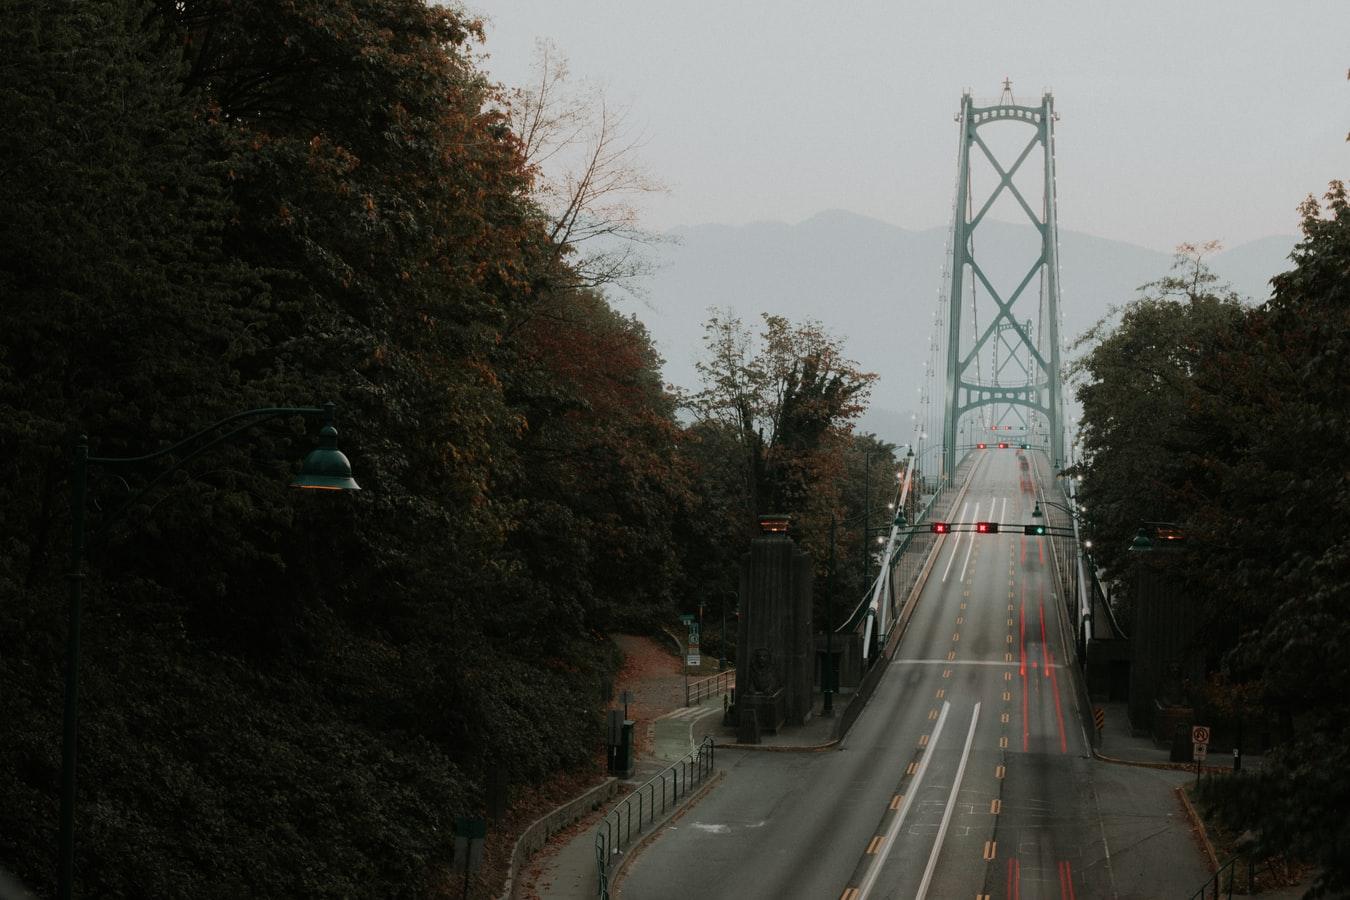 Vancouver's Stanley Park